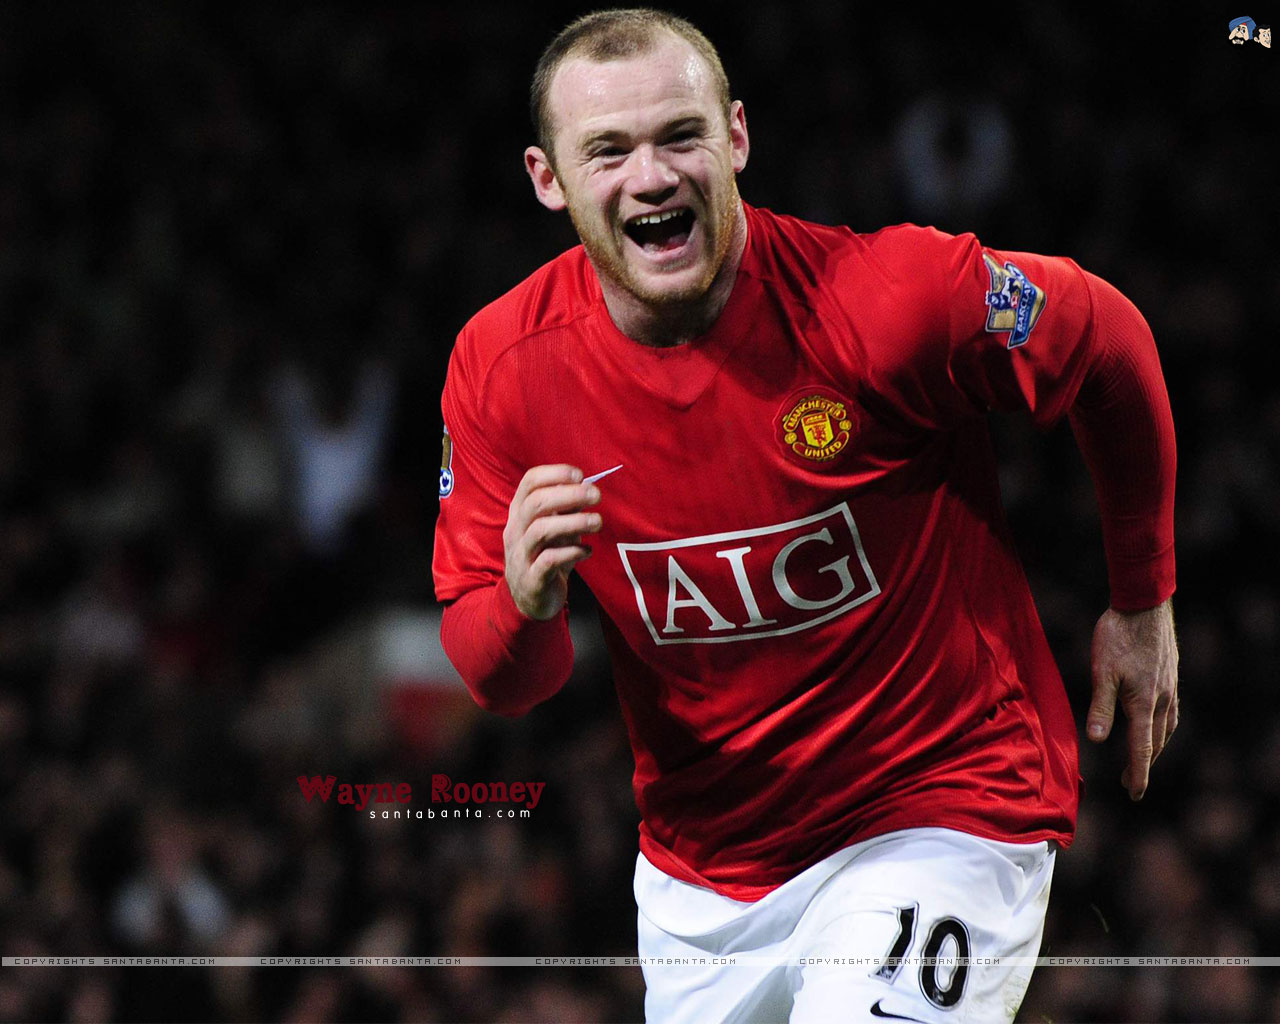 Wayne Rooney Football